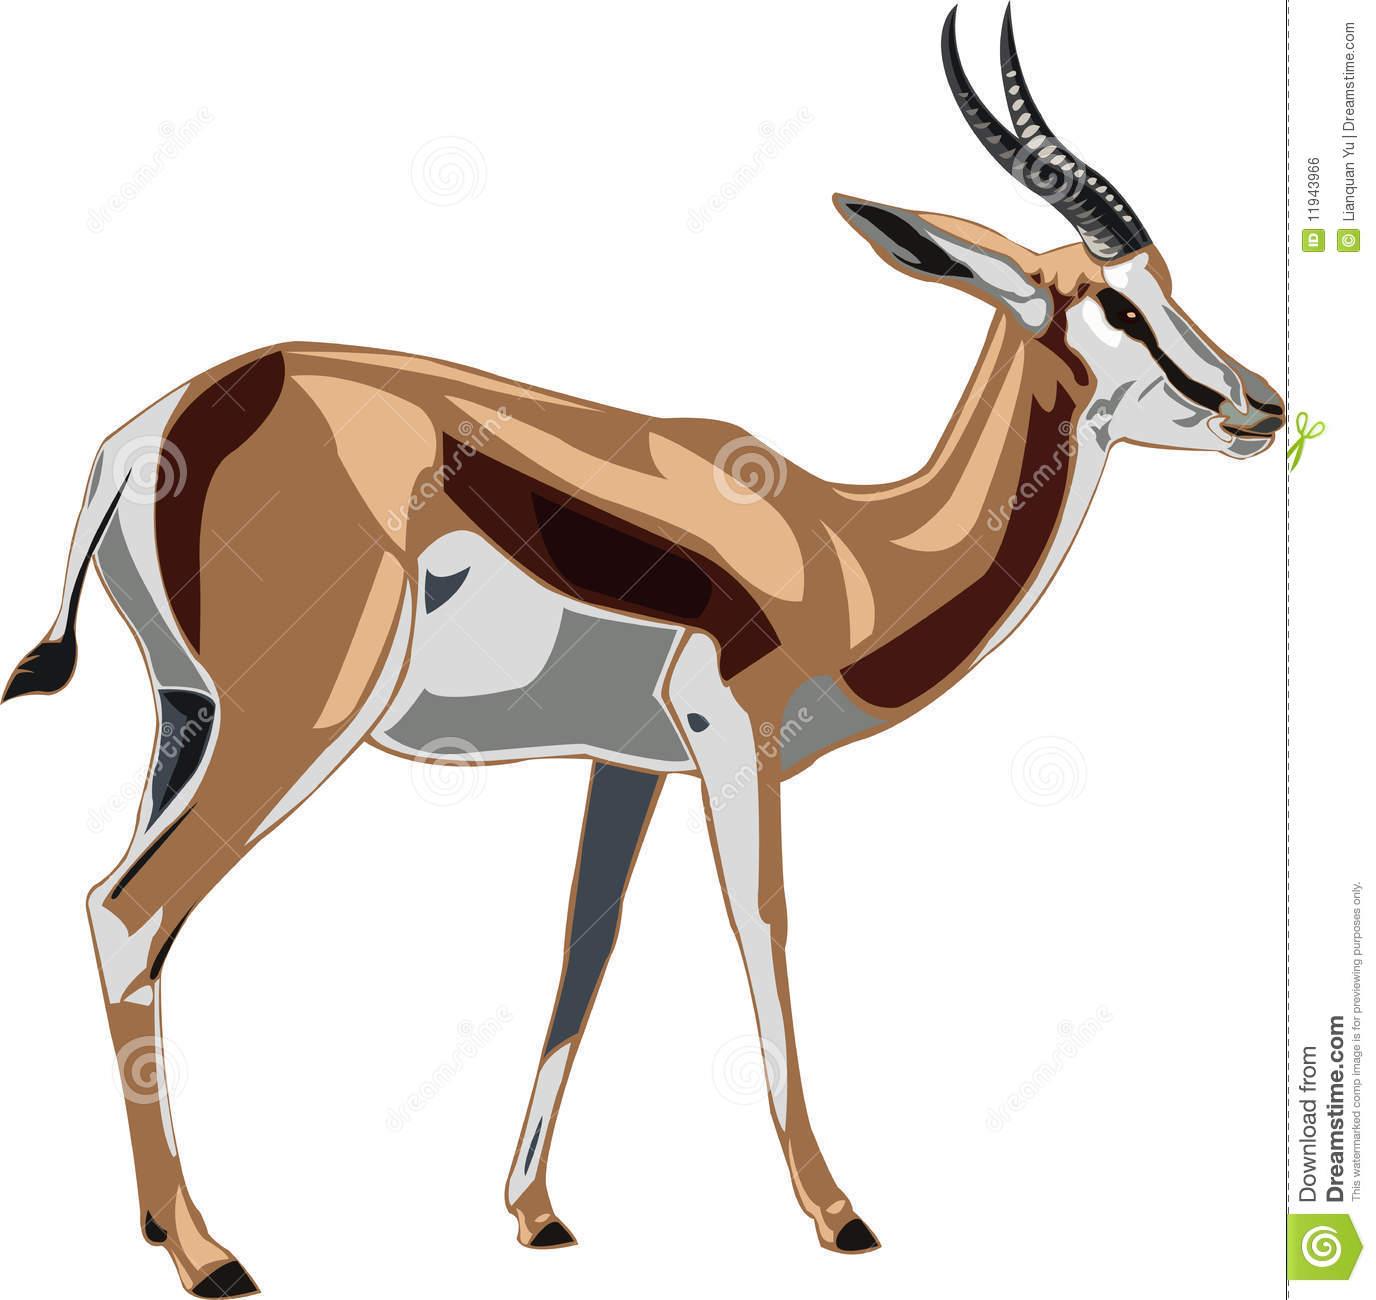 Springbok clipart #1, Download drawings